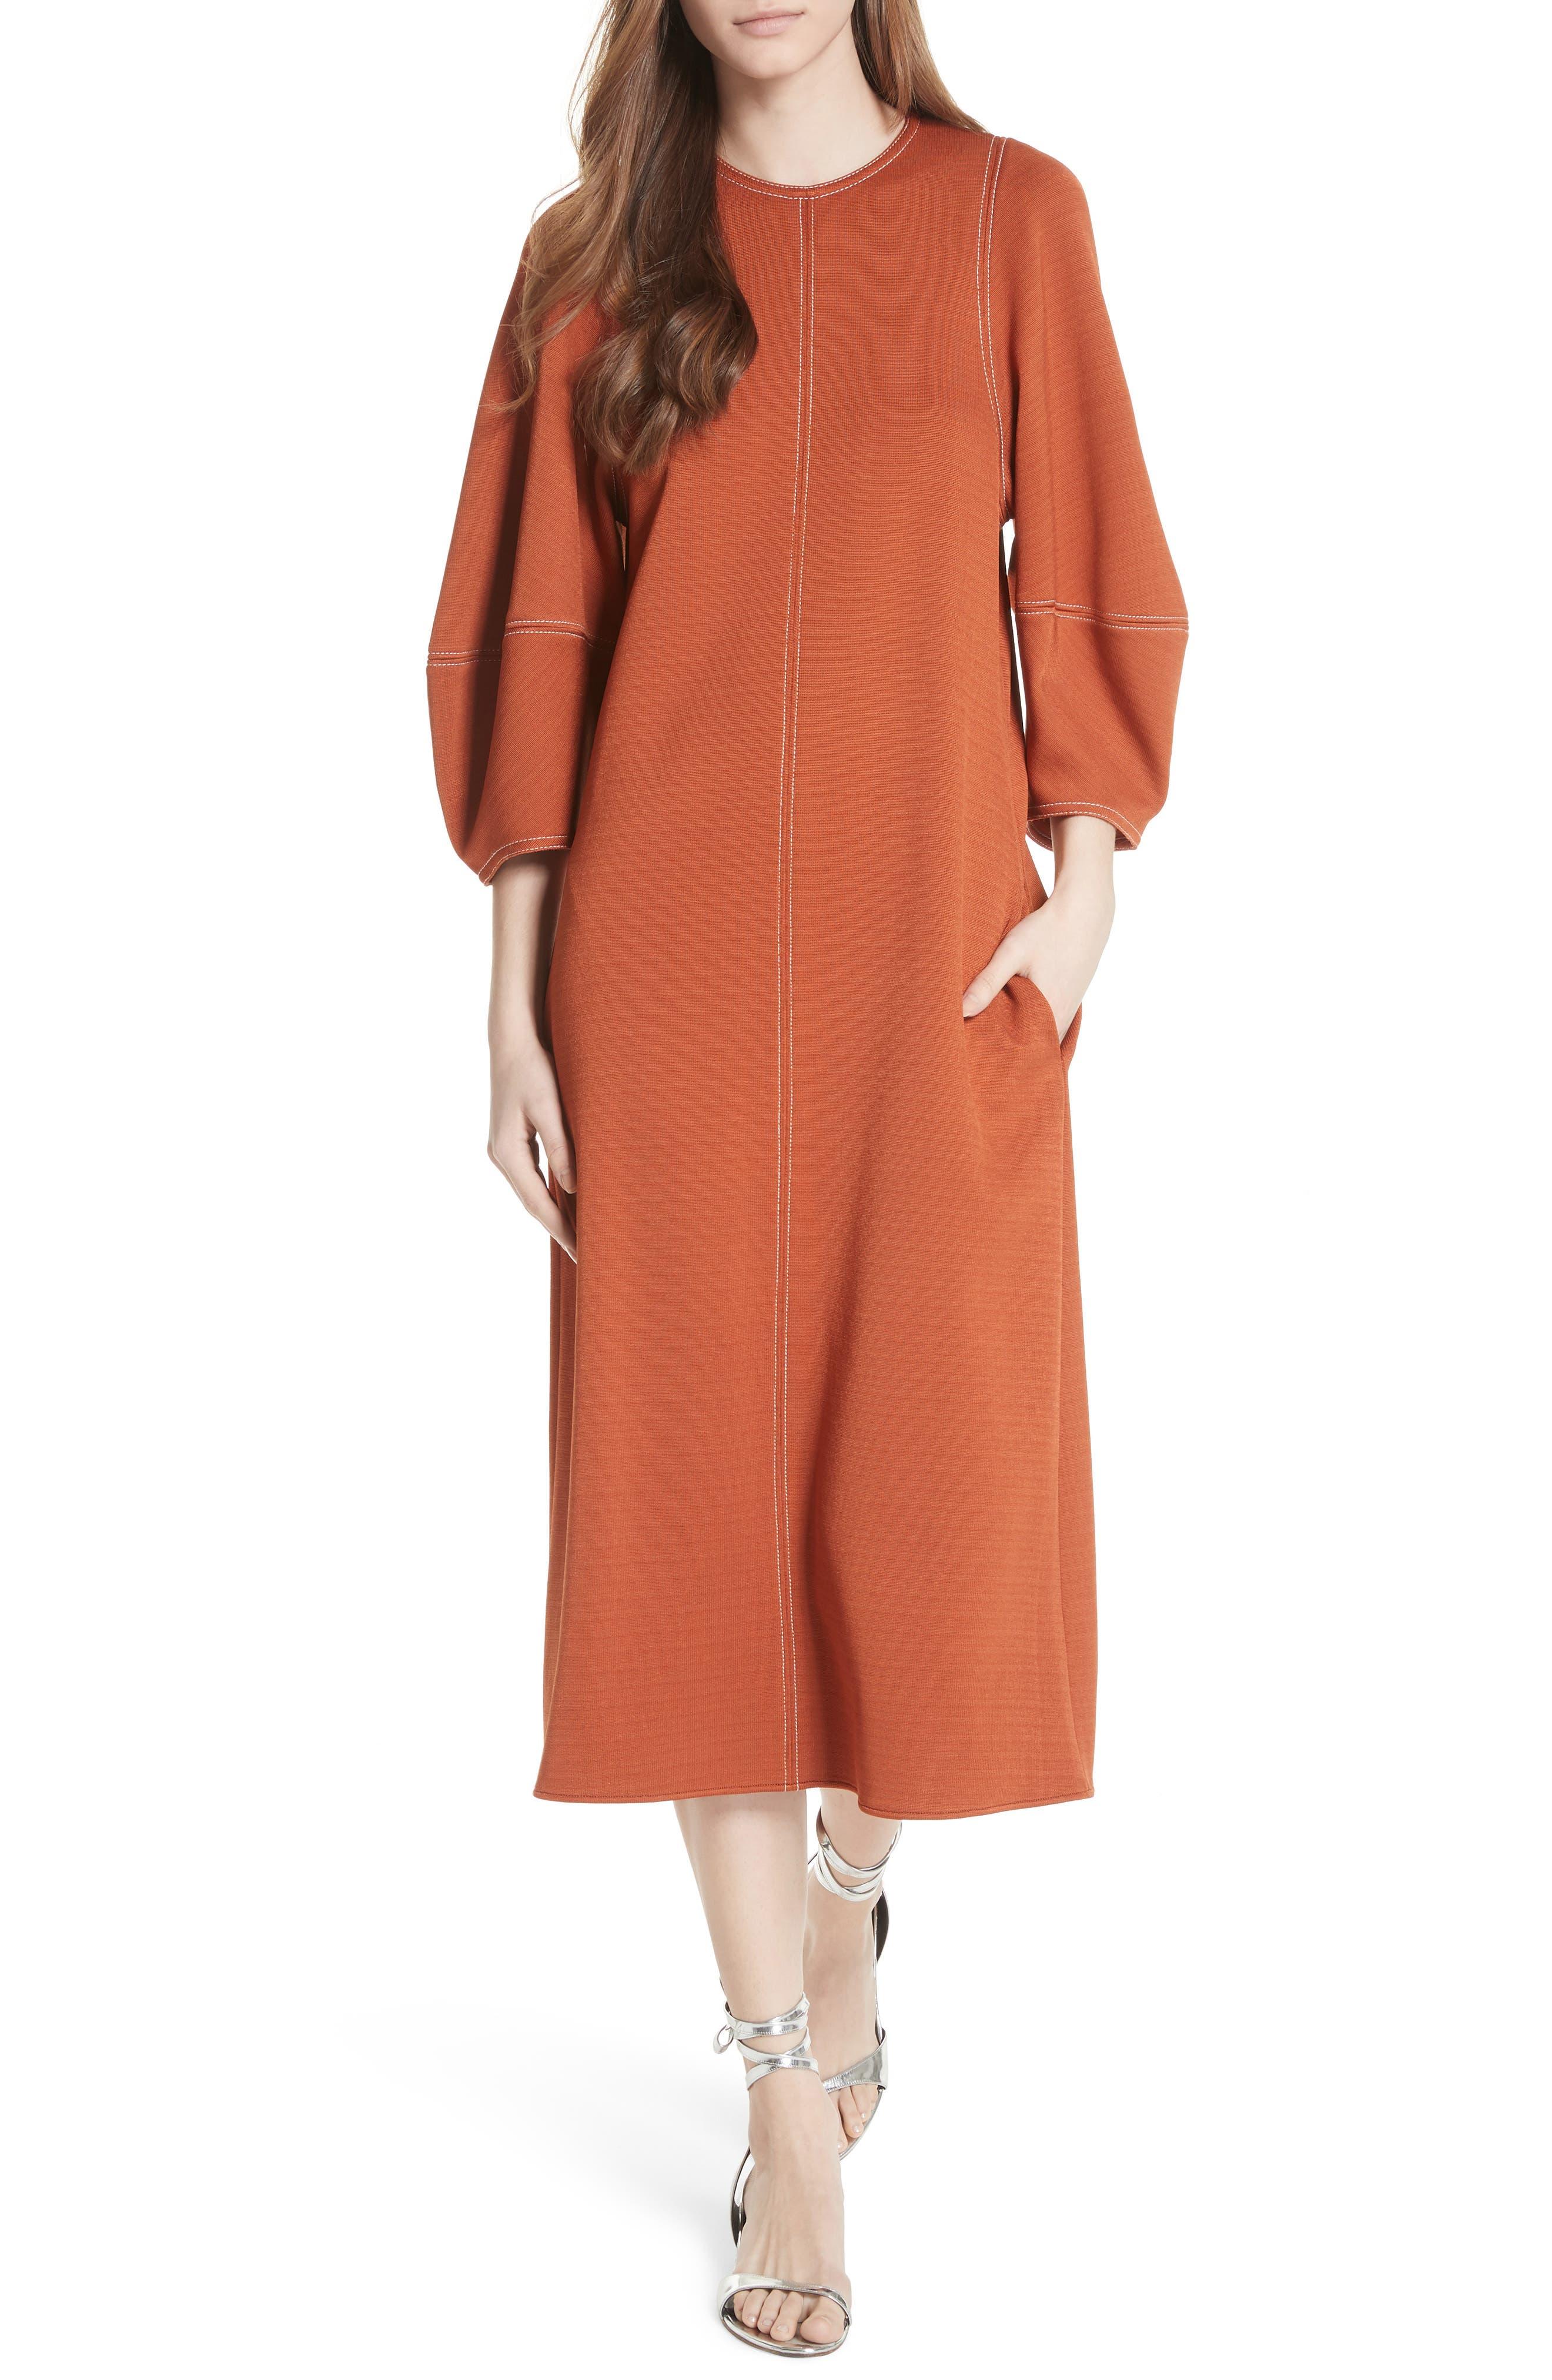 Main Image - Tibi Balloon Sleeve Crepe Knit Midi Dress